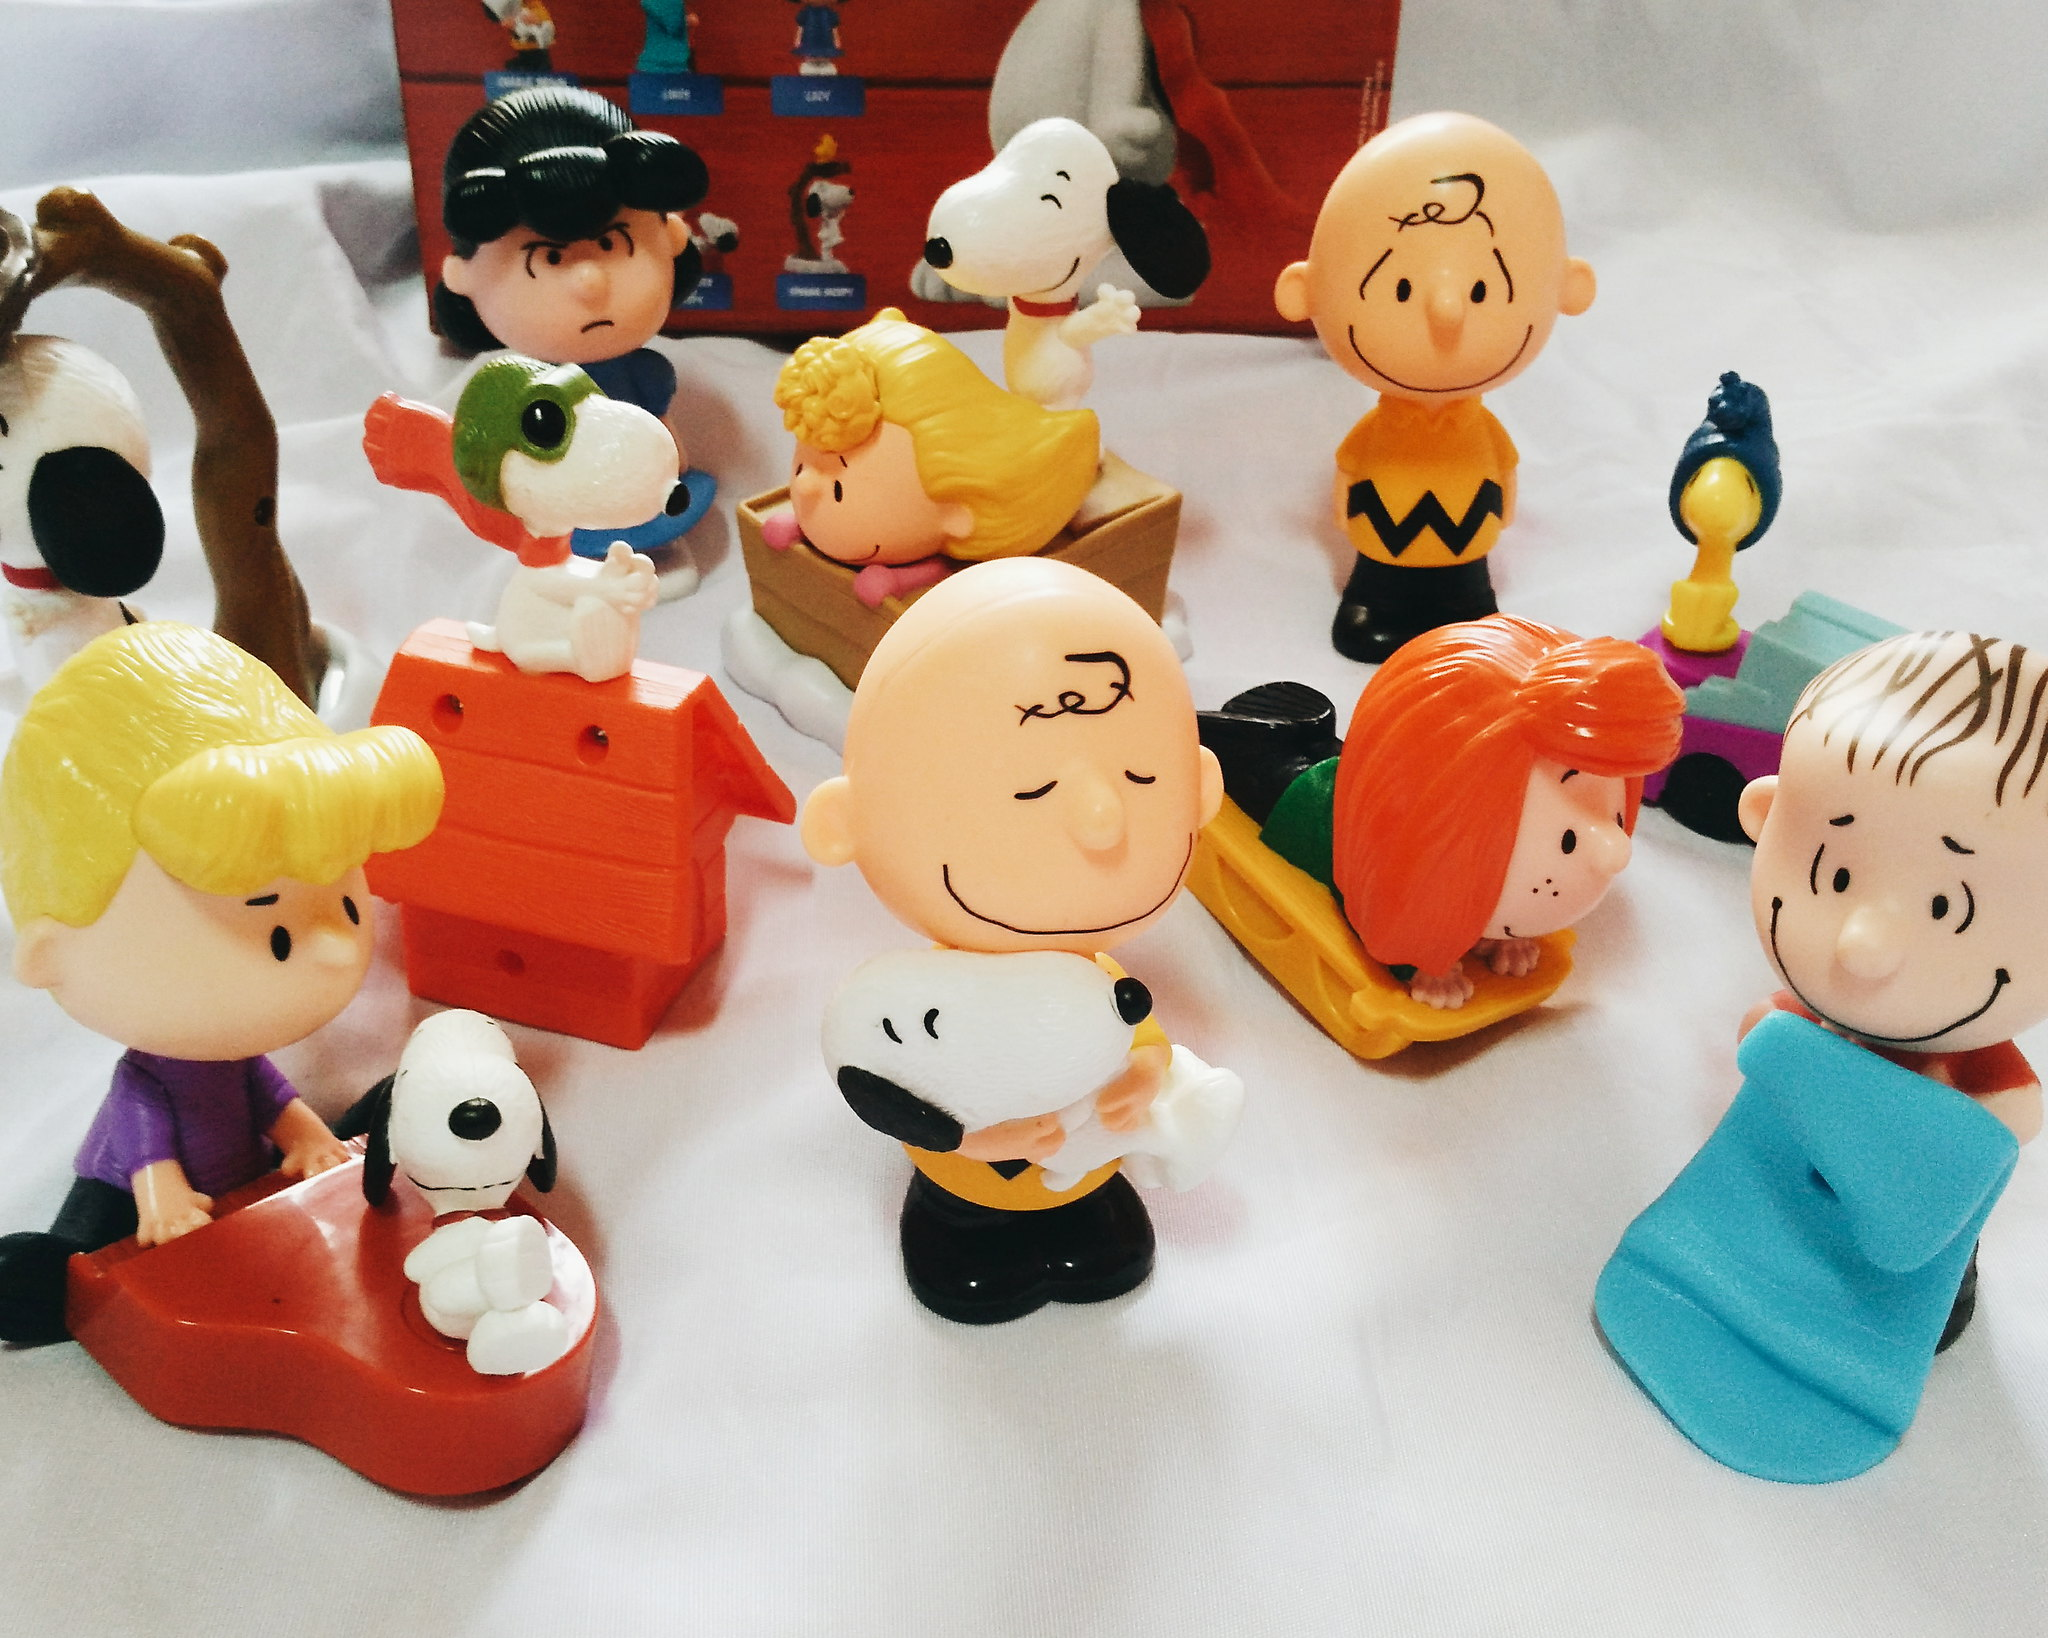 snoopy mcdo happy meal toys